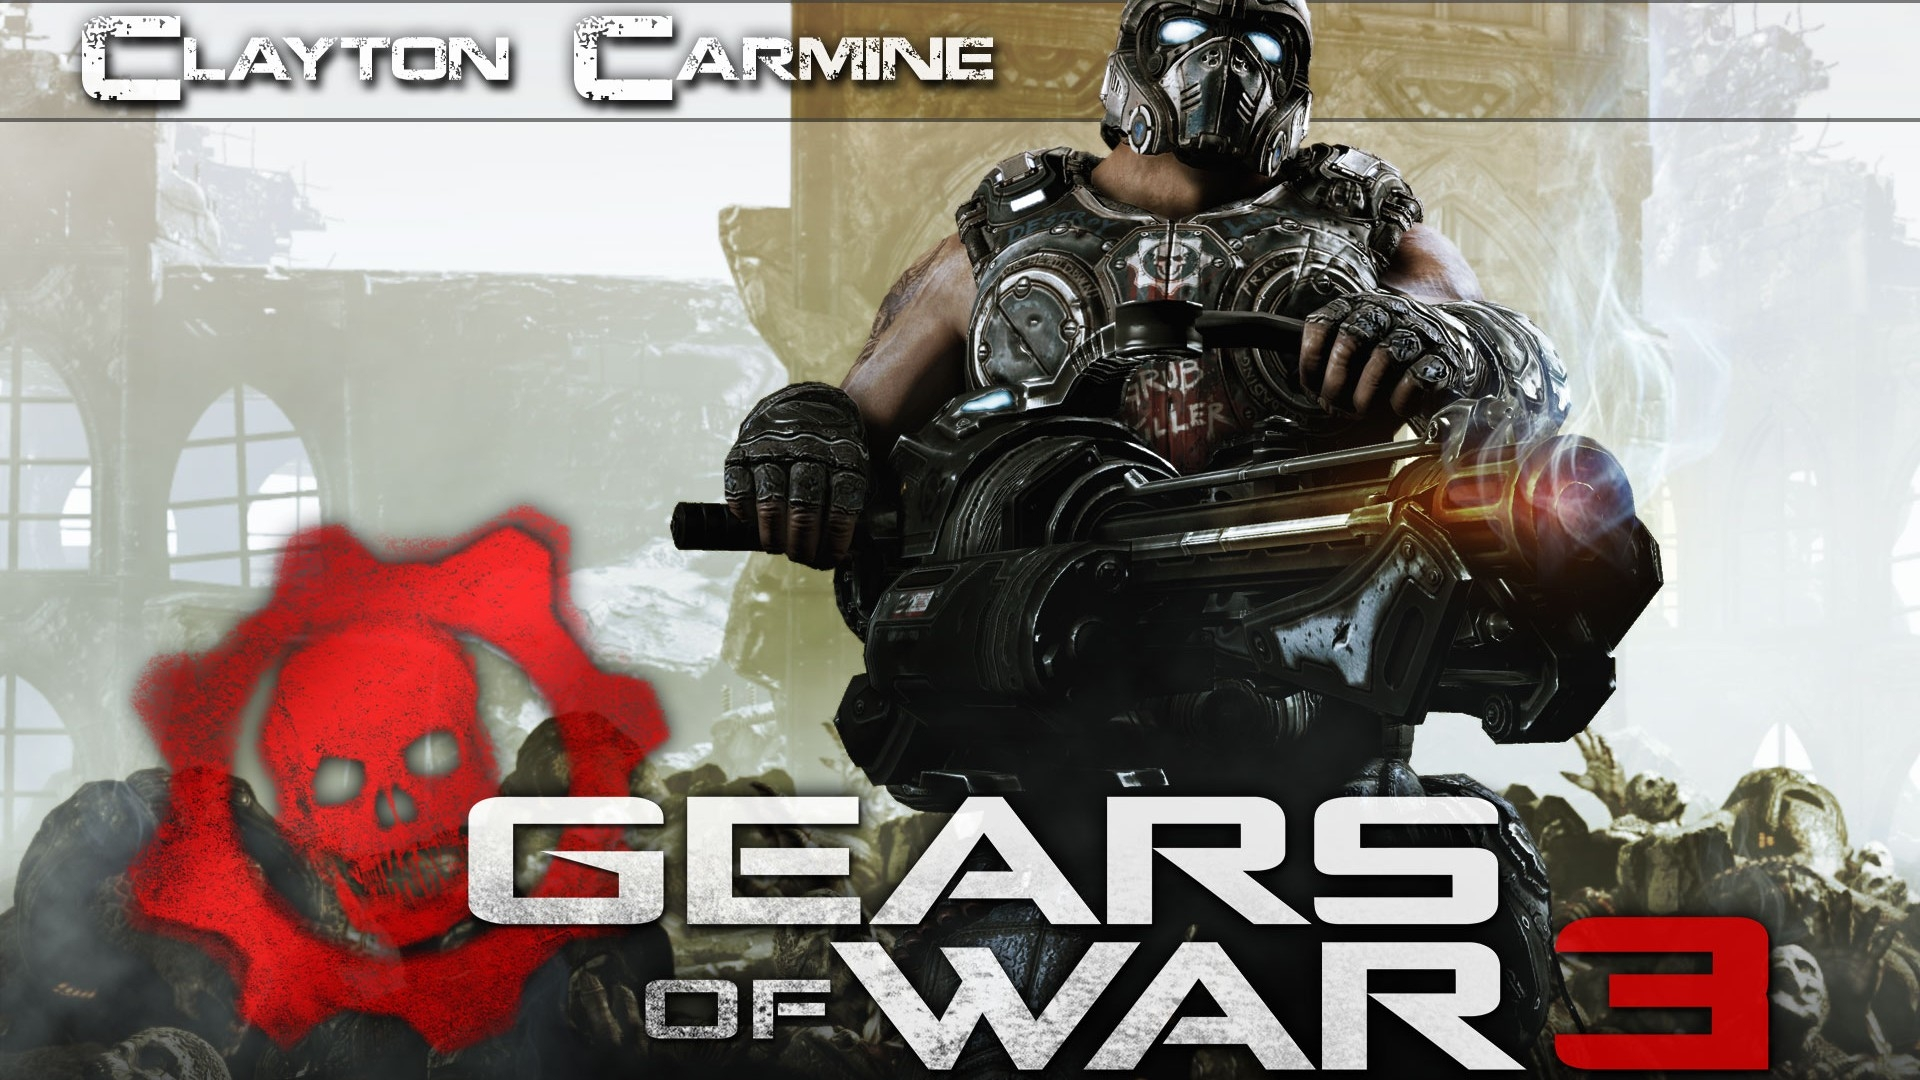 Download wallpaper 1920x1080 gears of war 3 clayton carmine gun skull helmet full hd 1080p - Gears of war carmine wallpaper ...